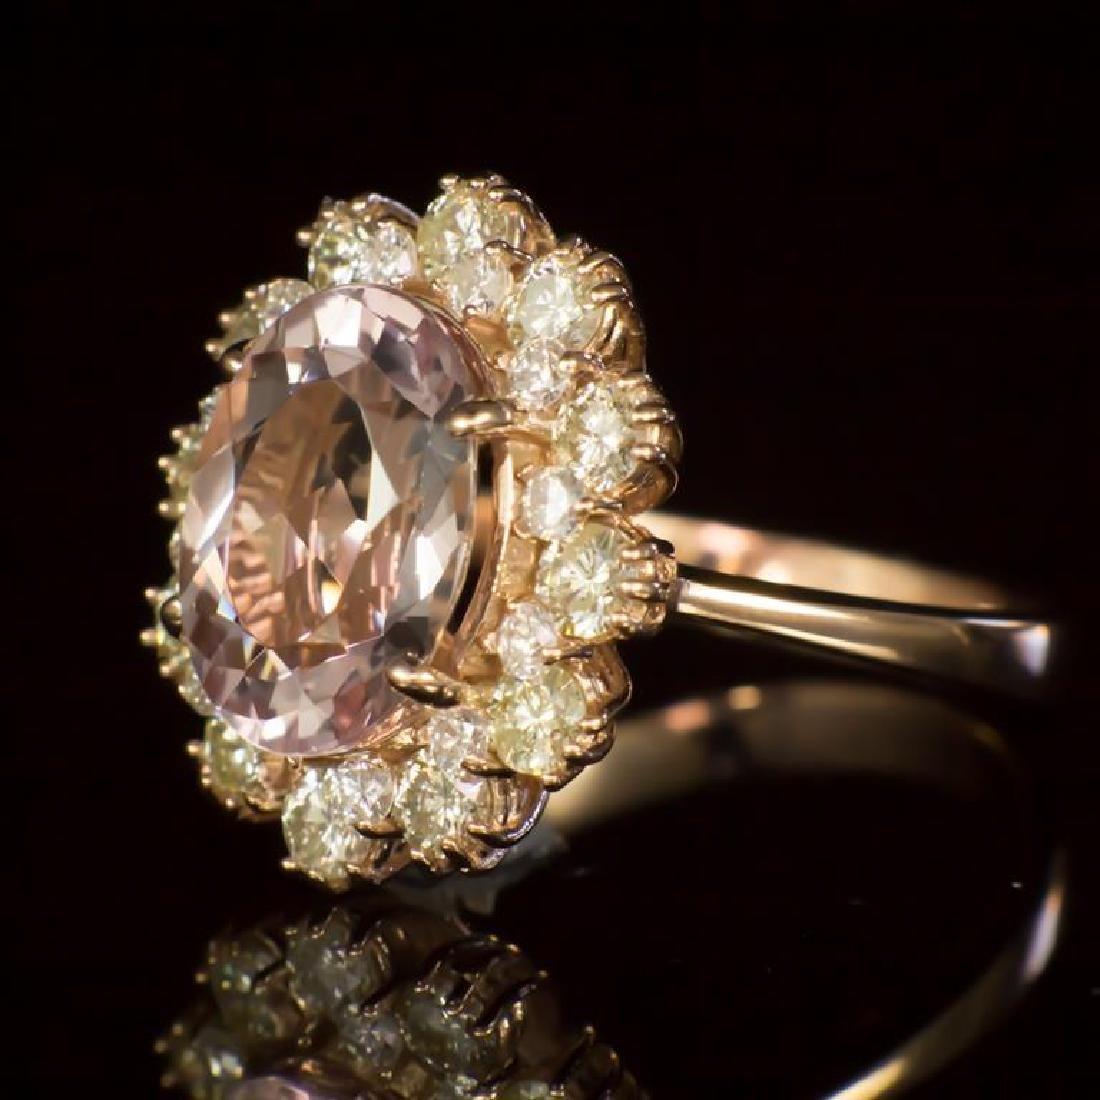 14K Gold 3.53ct Morganite 1.45ct Diamond Ring - 2